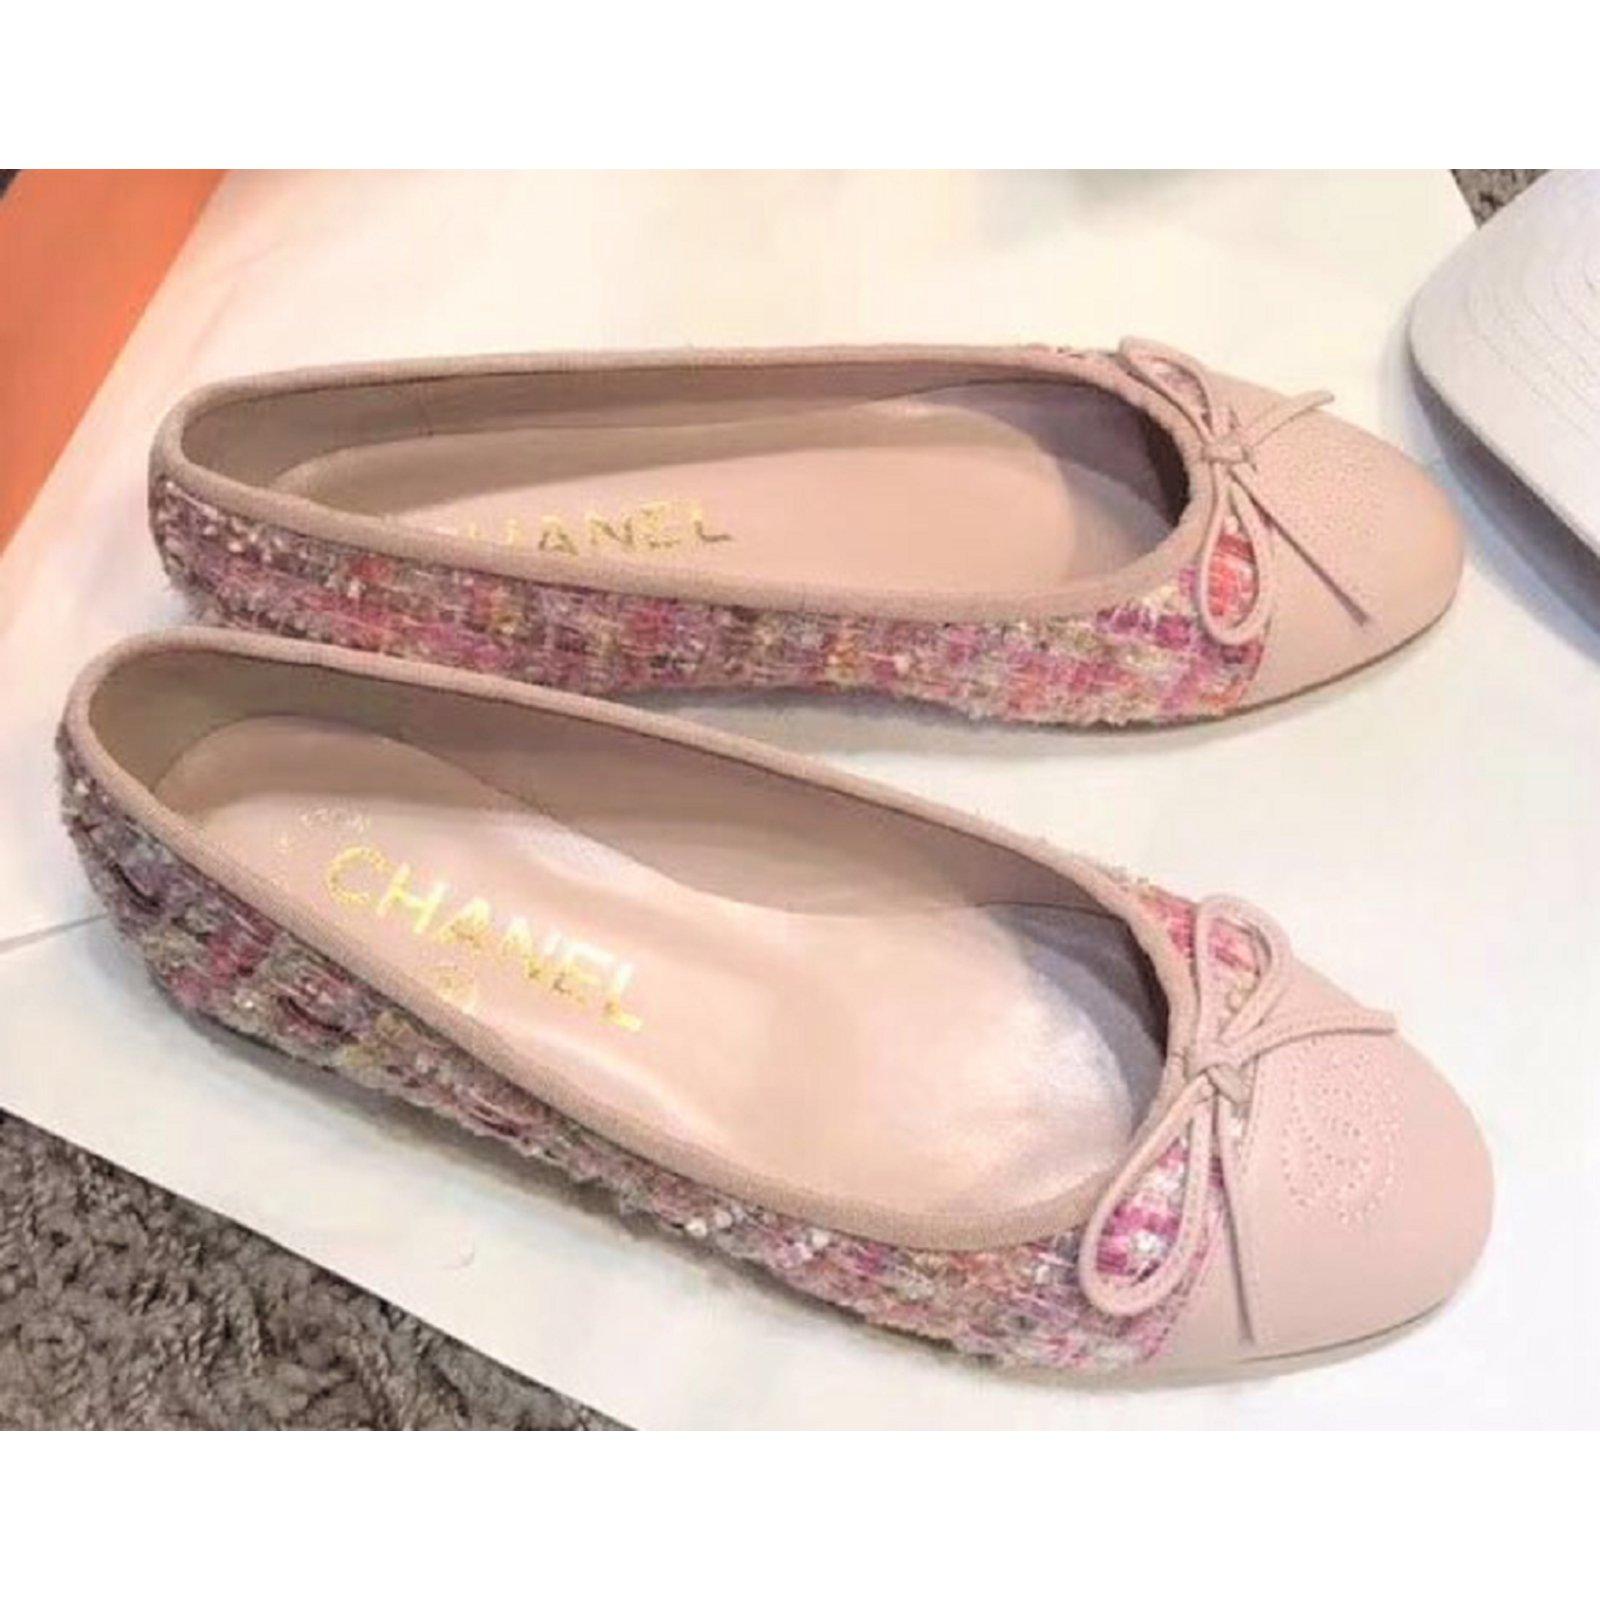 chanel flats pink